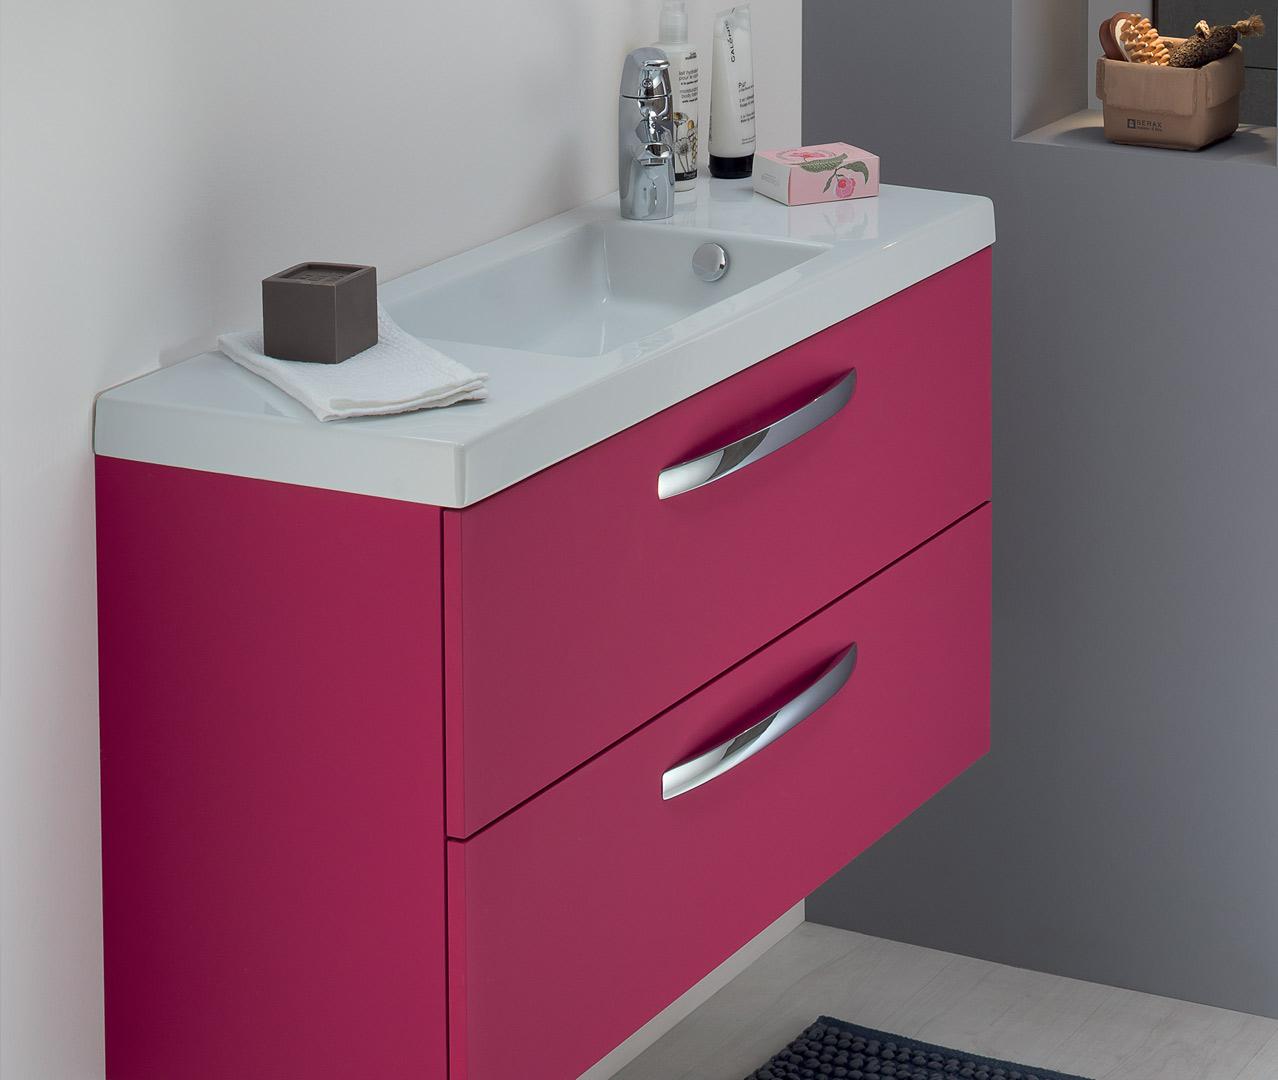 100 sanijura meuble salle bain fabrication gamme for Distributeur meuble